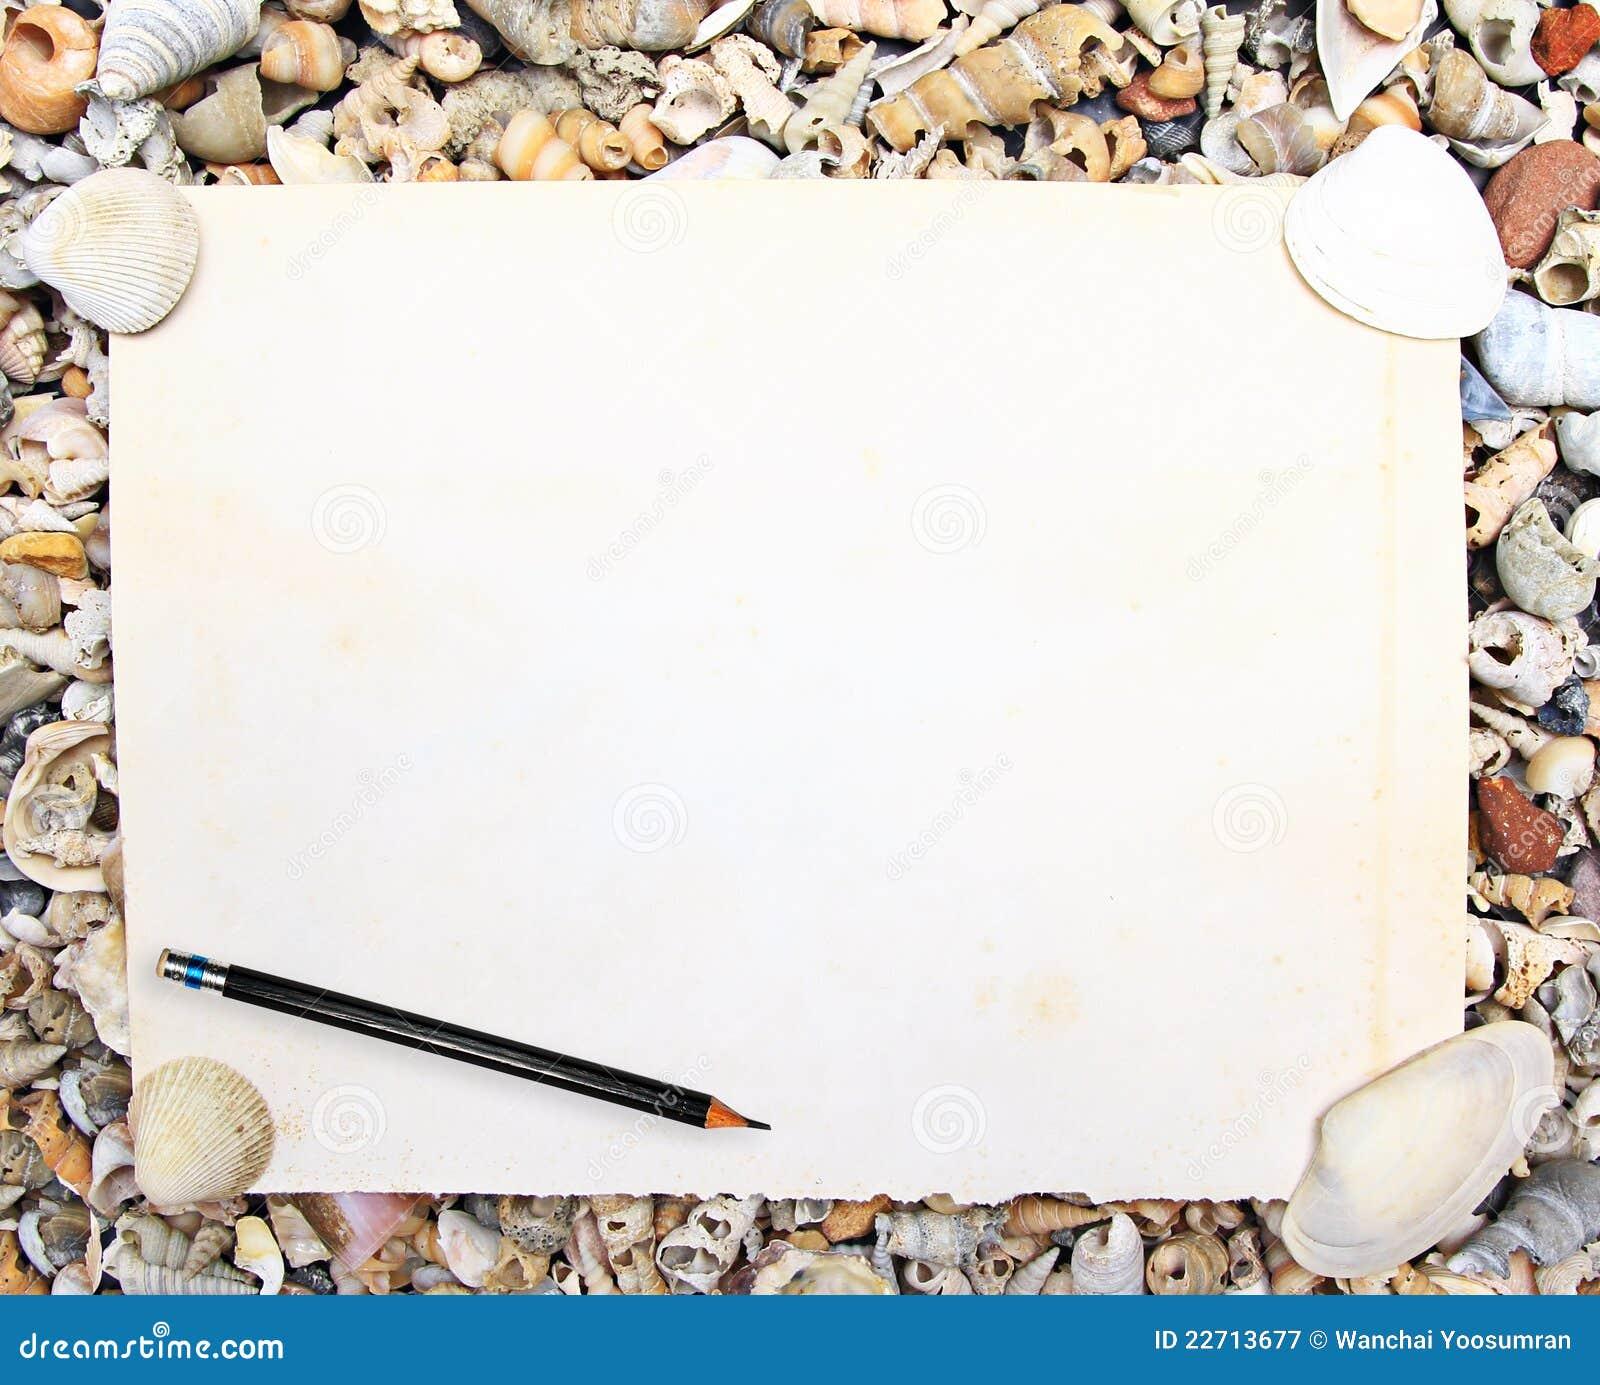 shell essay writing